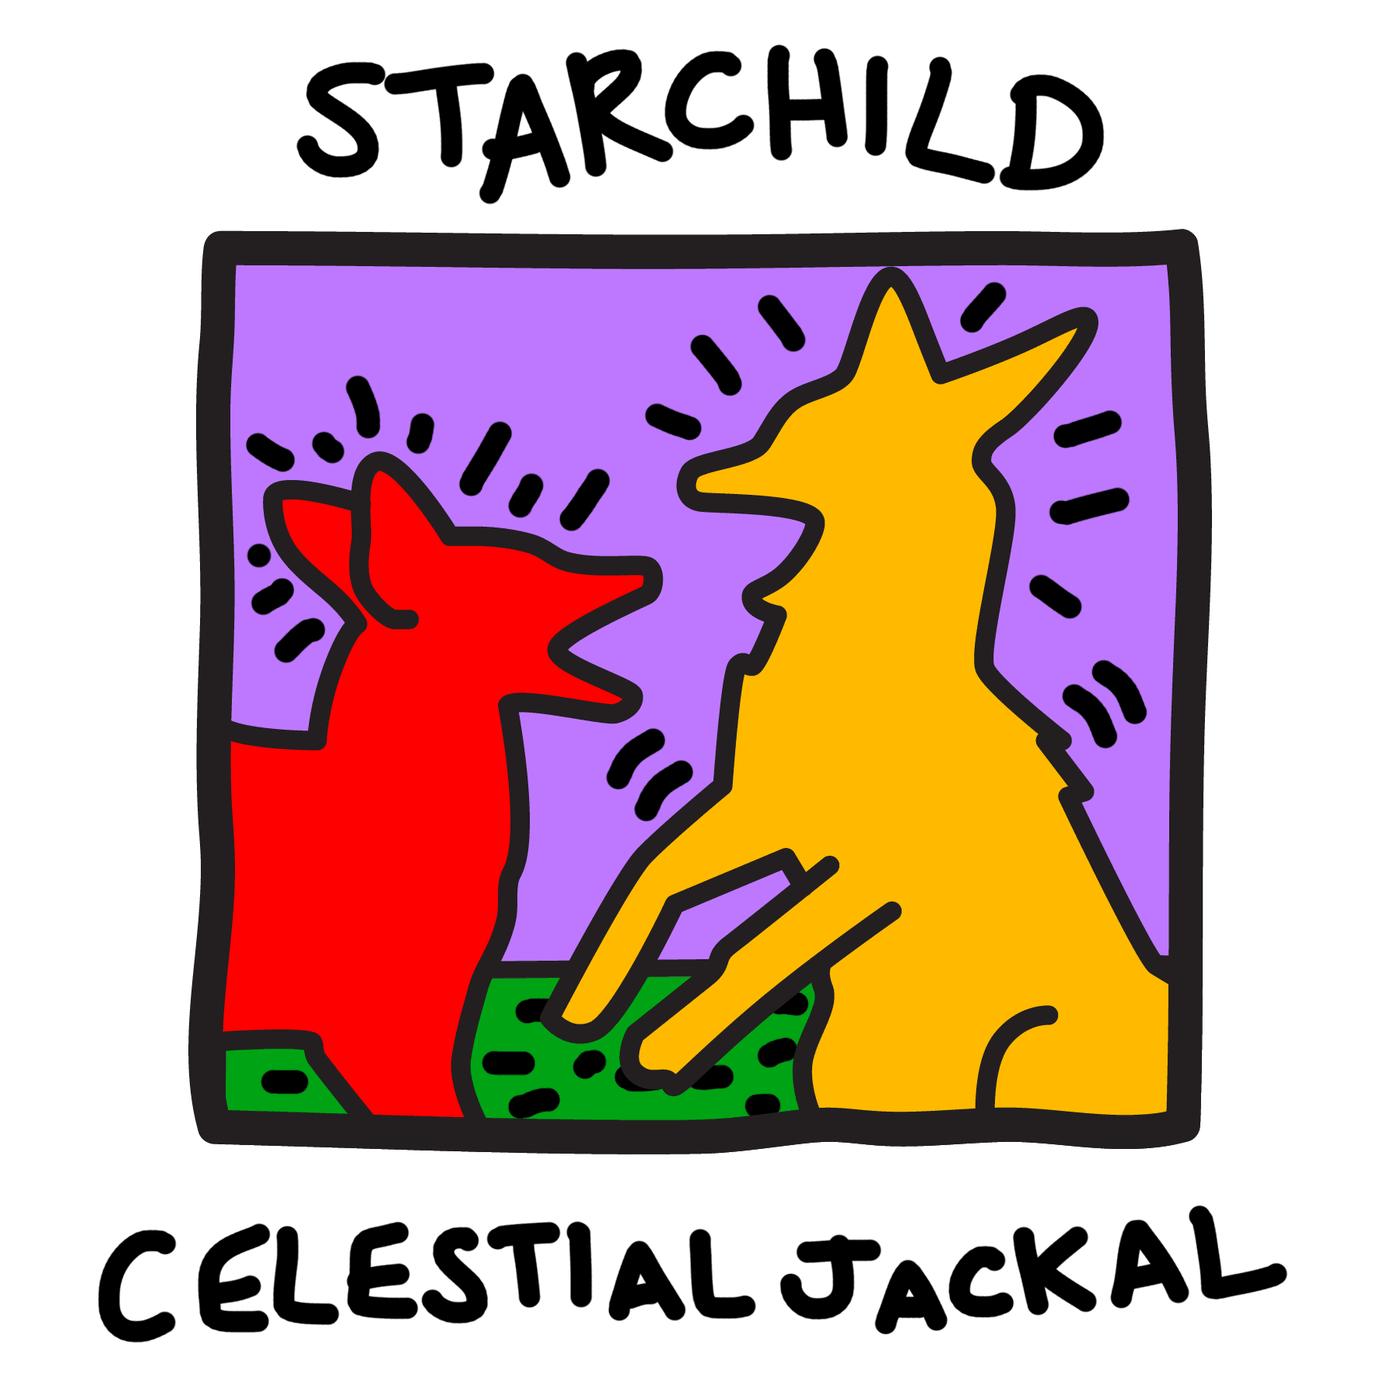 celestial jackal